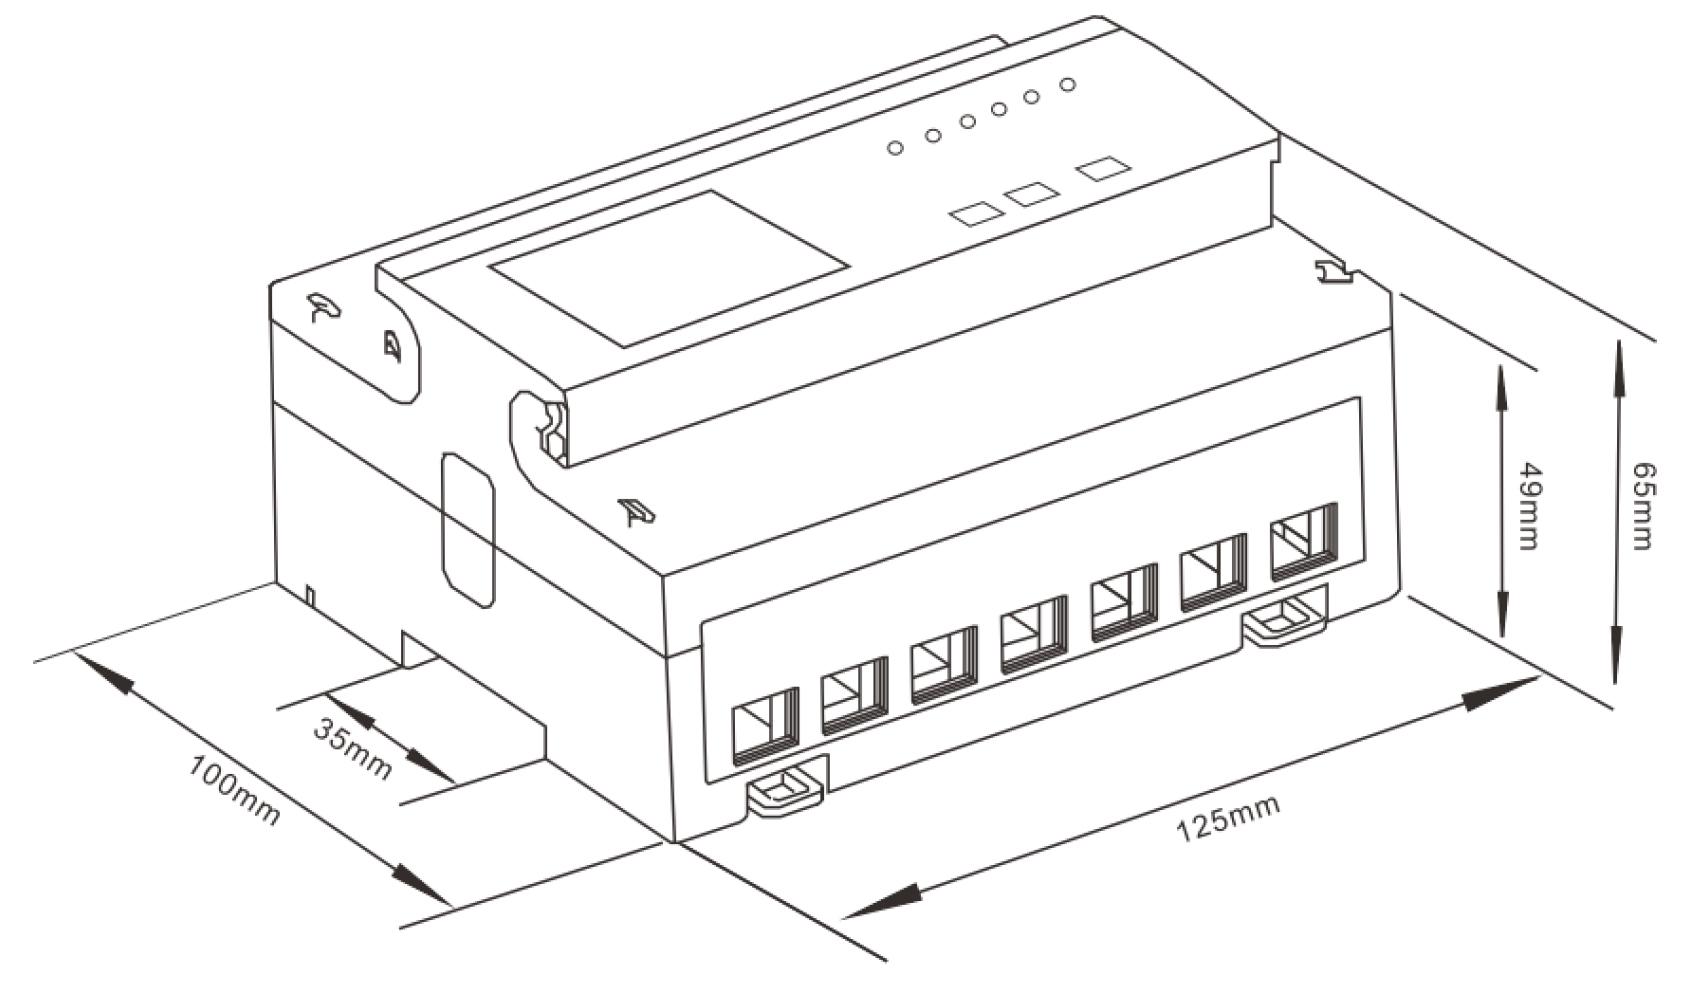 Portofrei Lcd Multifunktions Drehstromzahler S0 Rs485 10